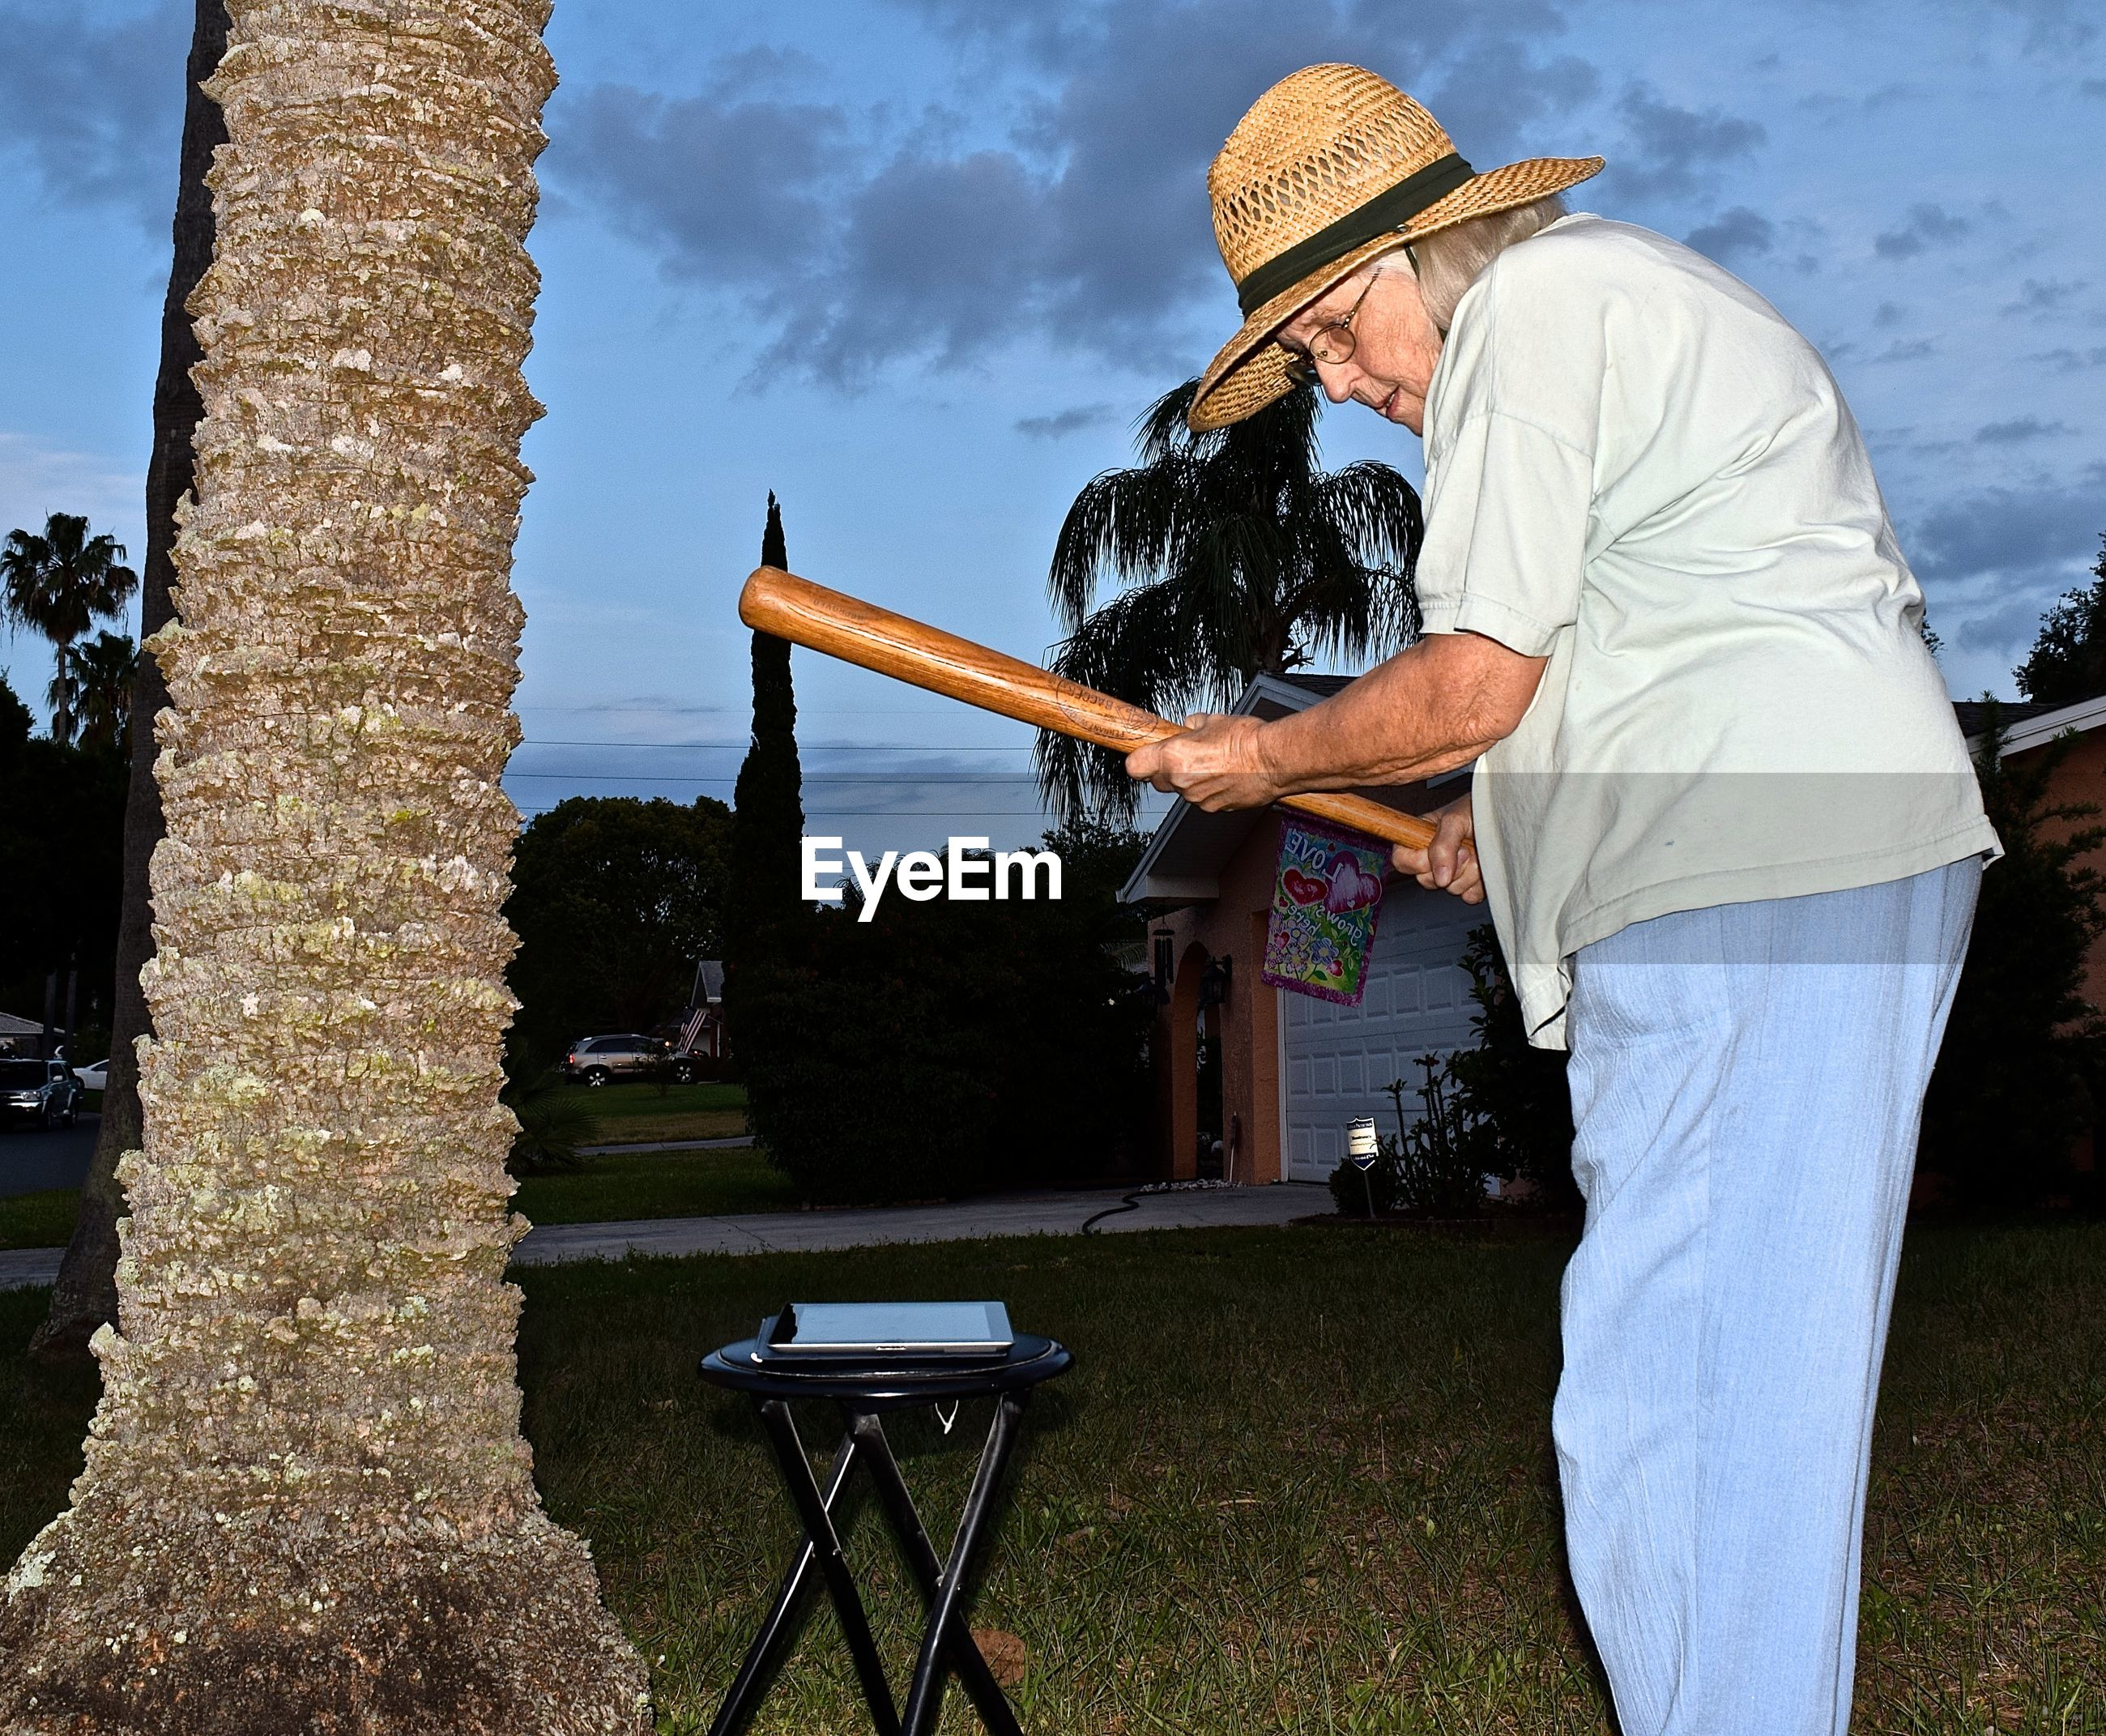 Woman with baseball bat looking at digital tablet on stool in yard at dusk